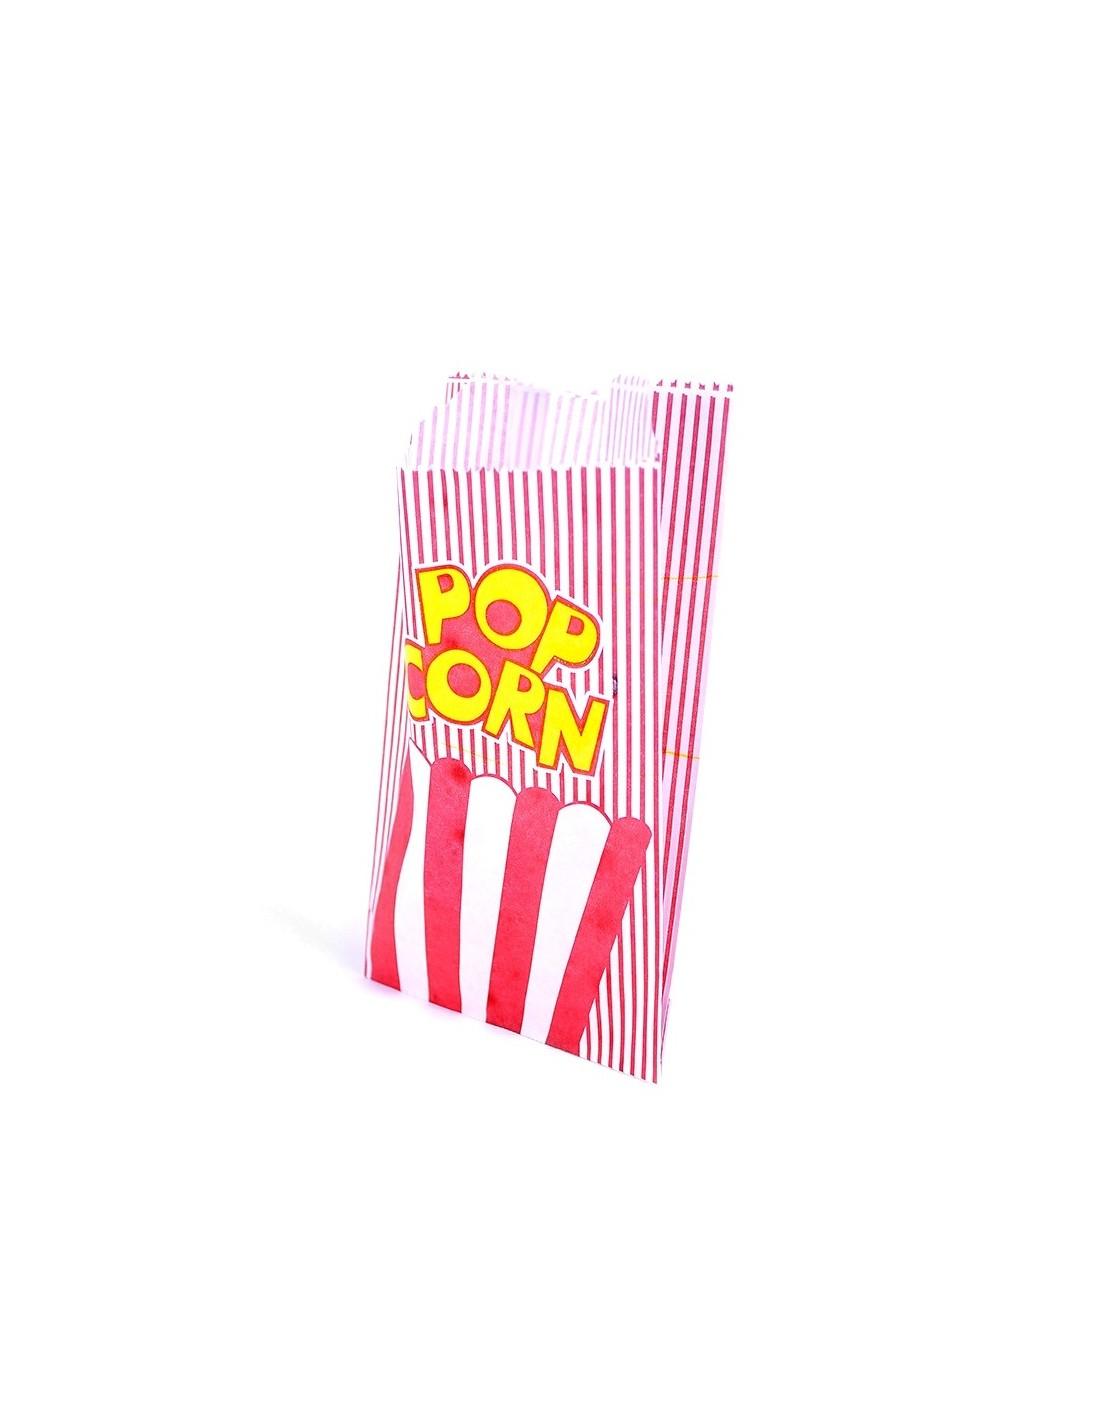 gm popcorn machine